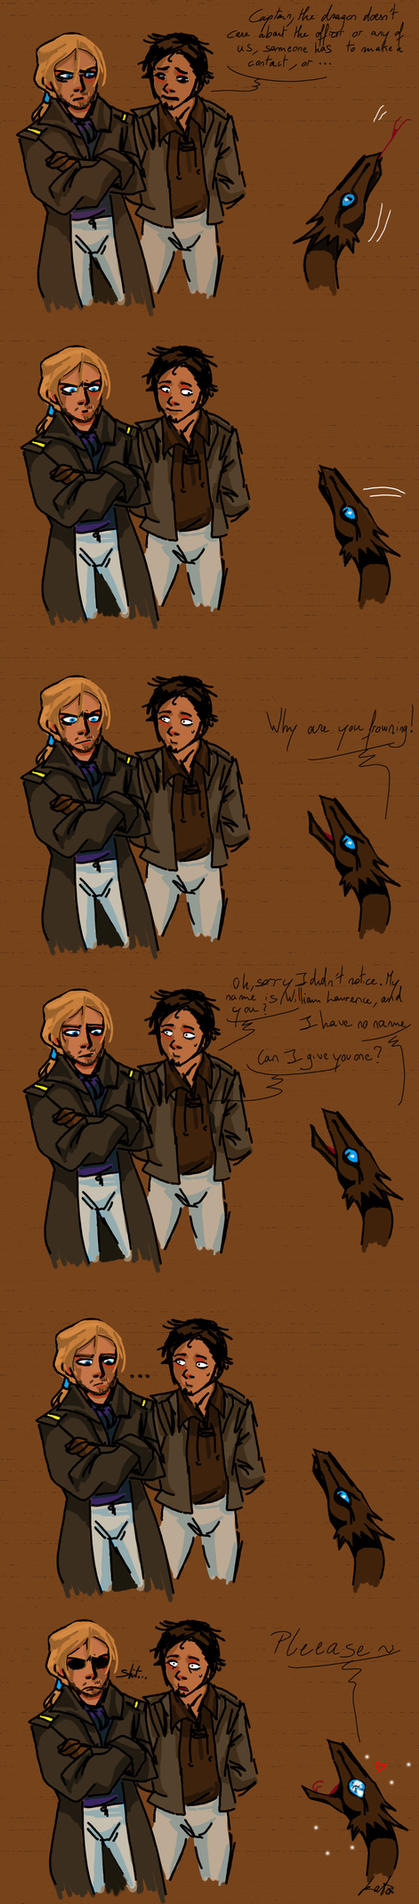 When Captain W.Laurence meet temeraire 3.0 by KuroKato